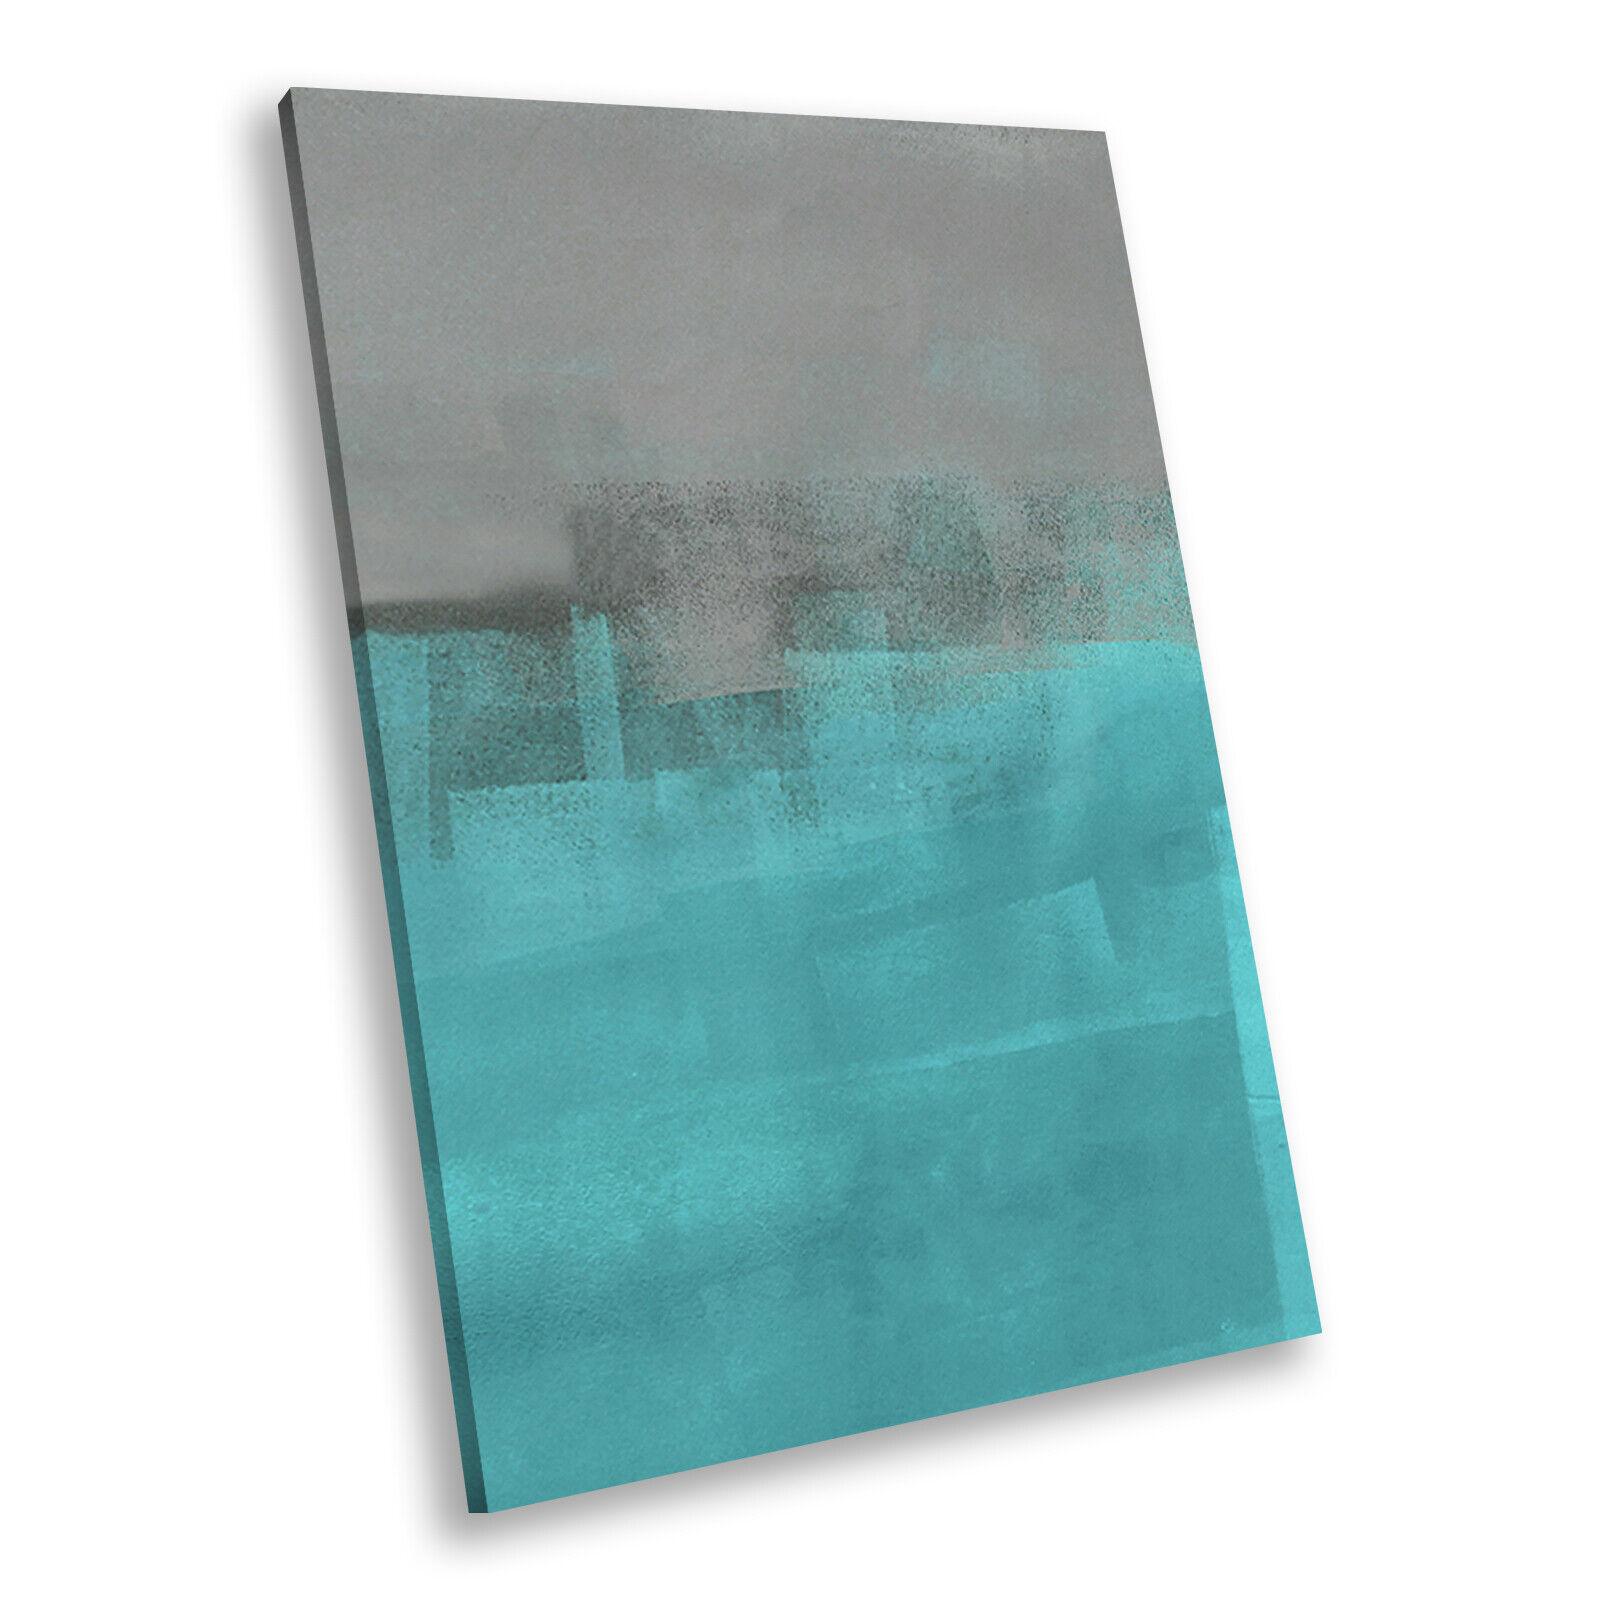 Retro Blau grau Cool Portrait Abstract Canvas Framed Kunst Large Bild